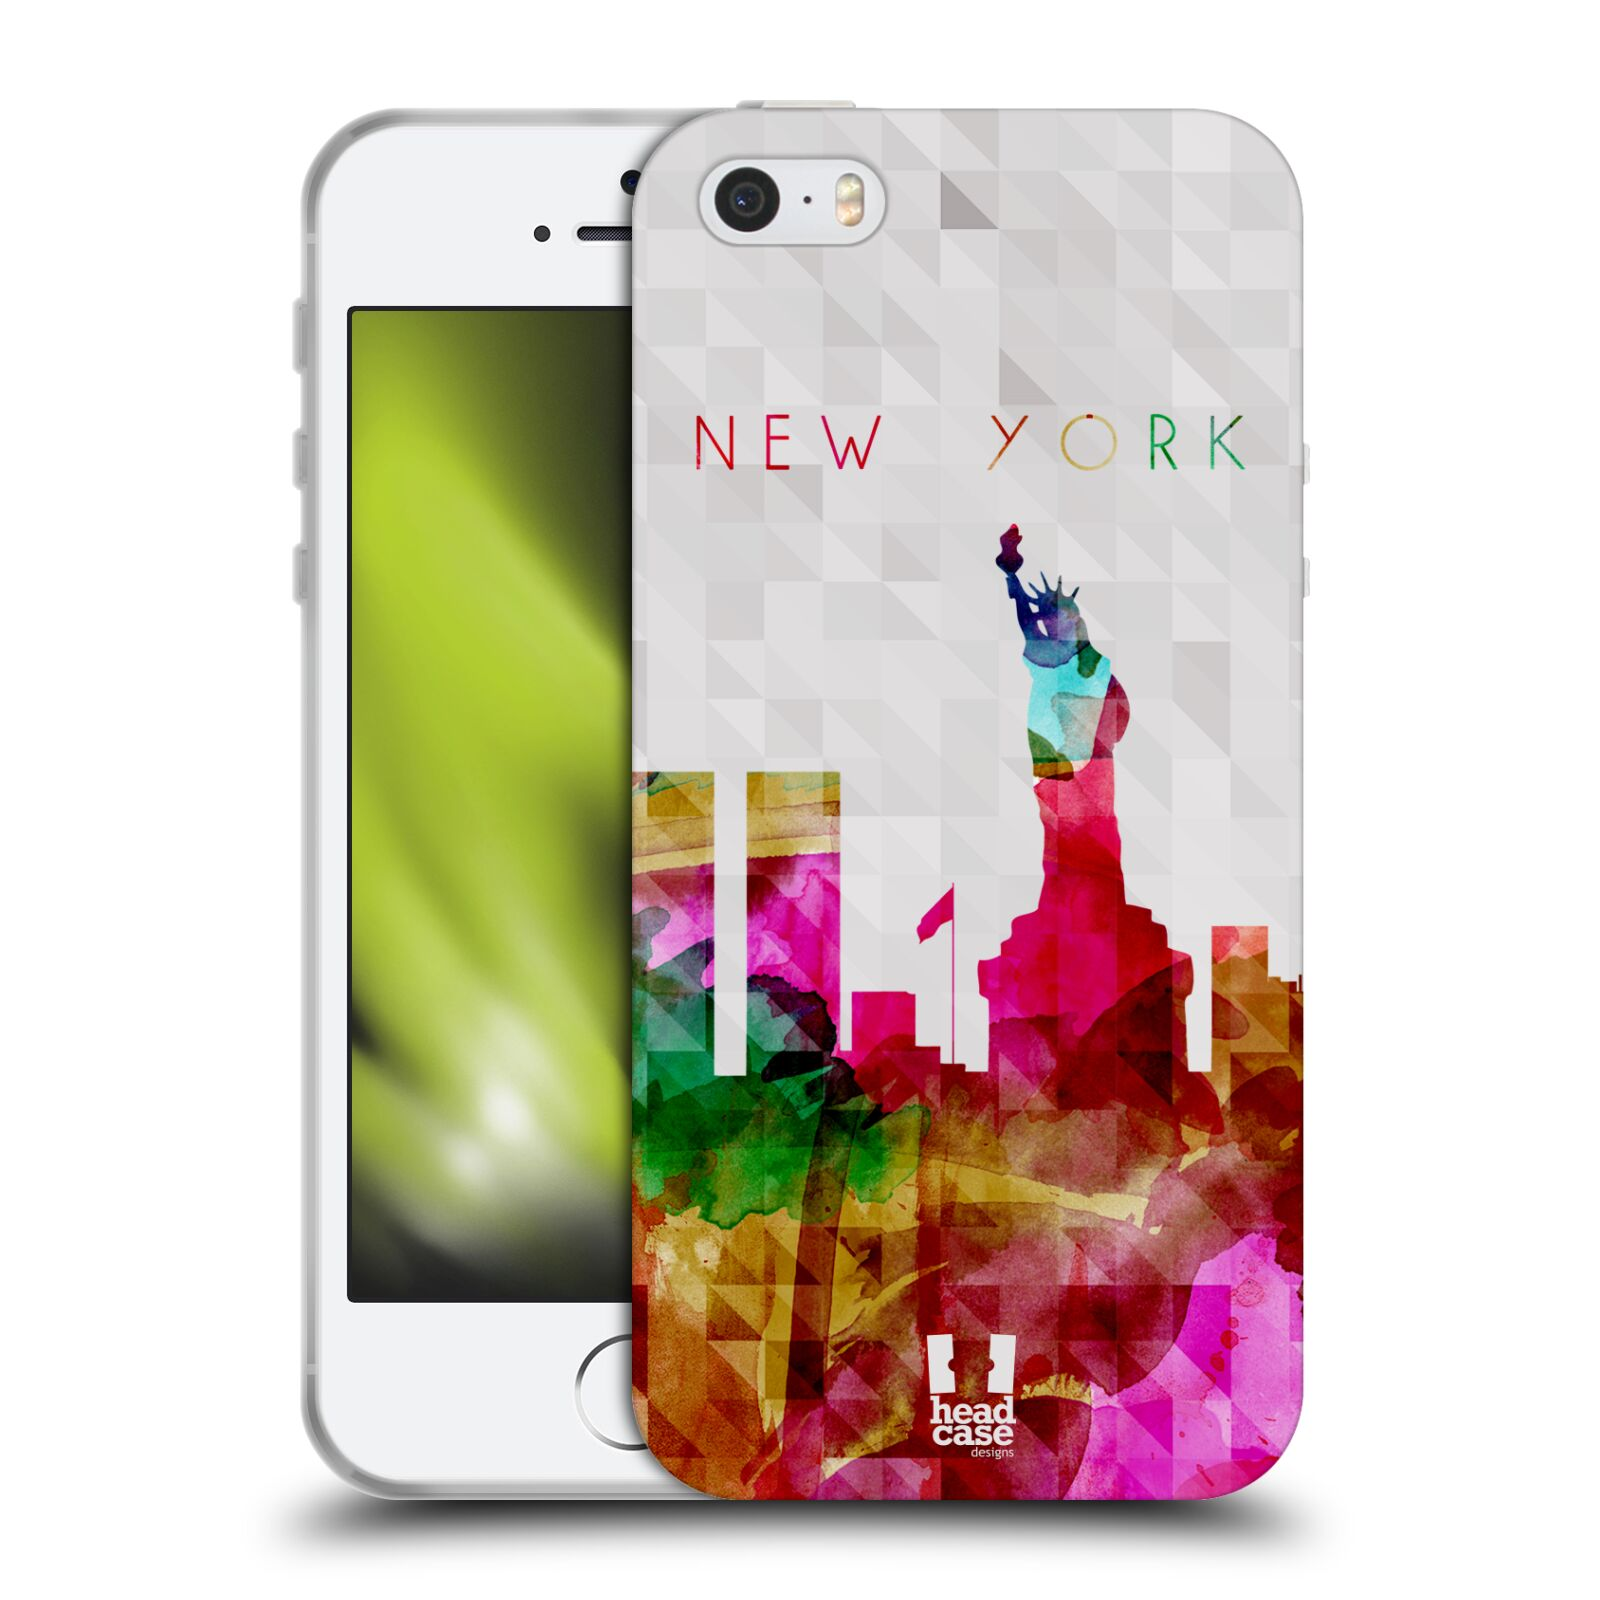 HEAD CASE silikonový obal na mobil Apple Iphone 5/5S vzor Vodní barva města silueta NEW YORK USA SOCHA SVOBODY